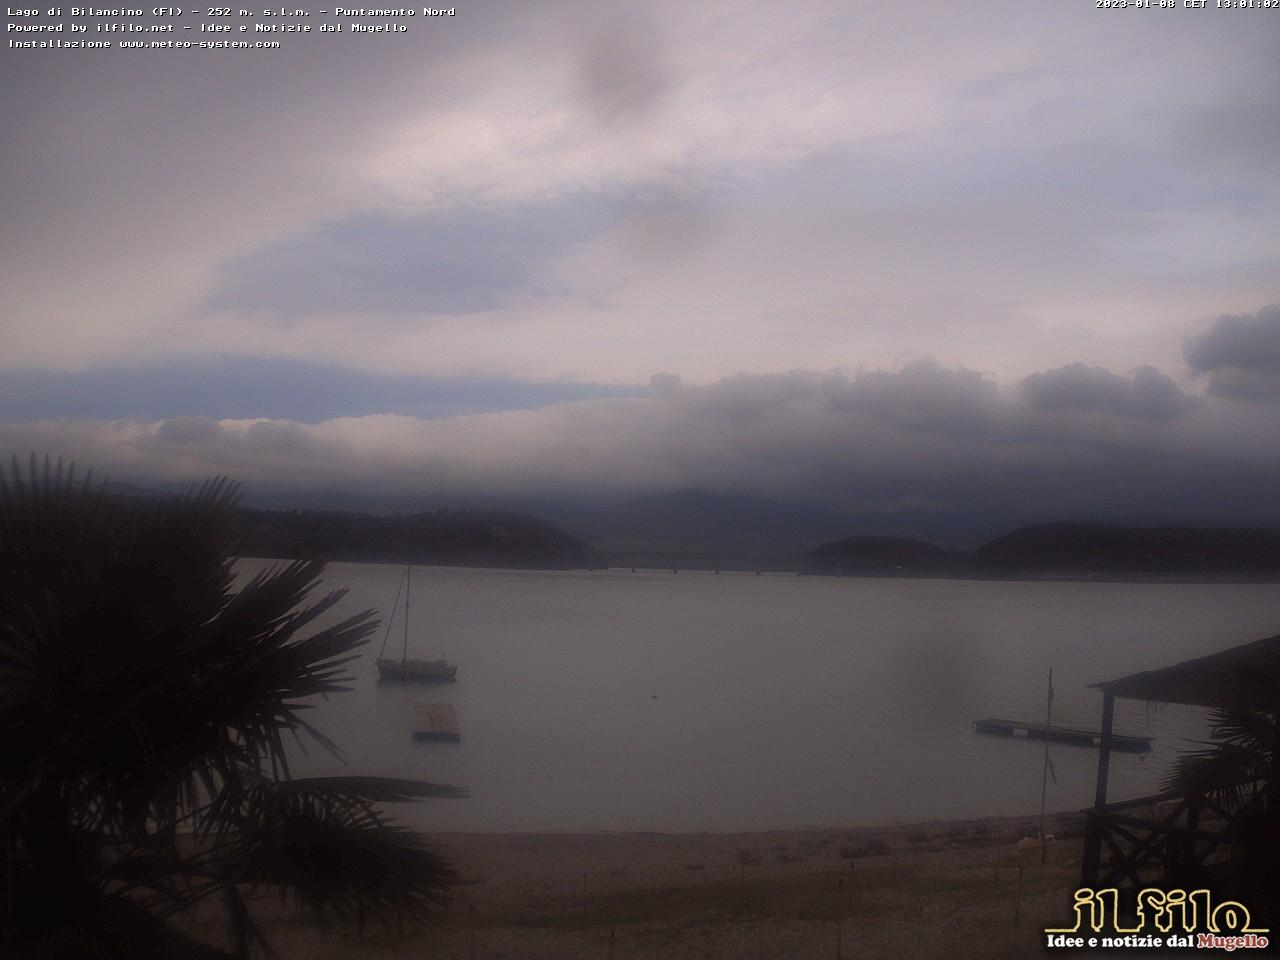 webcam Lago di Bilancino (FI)